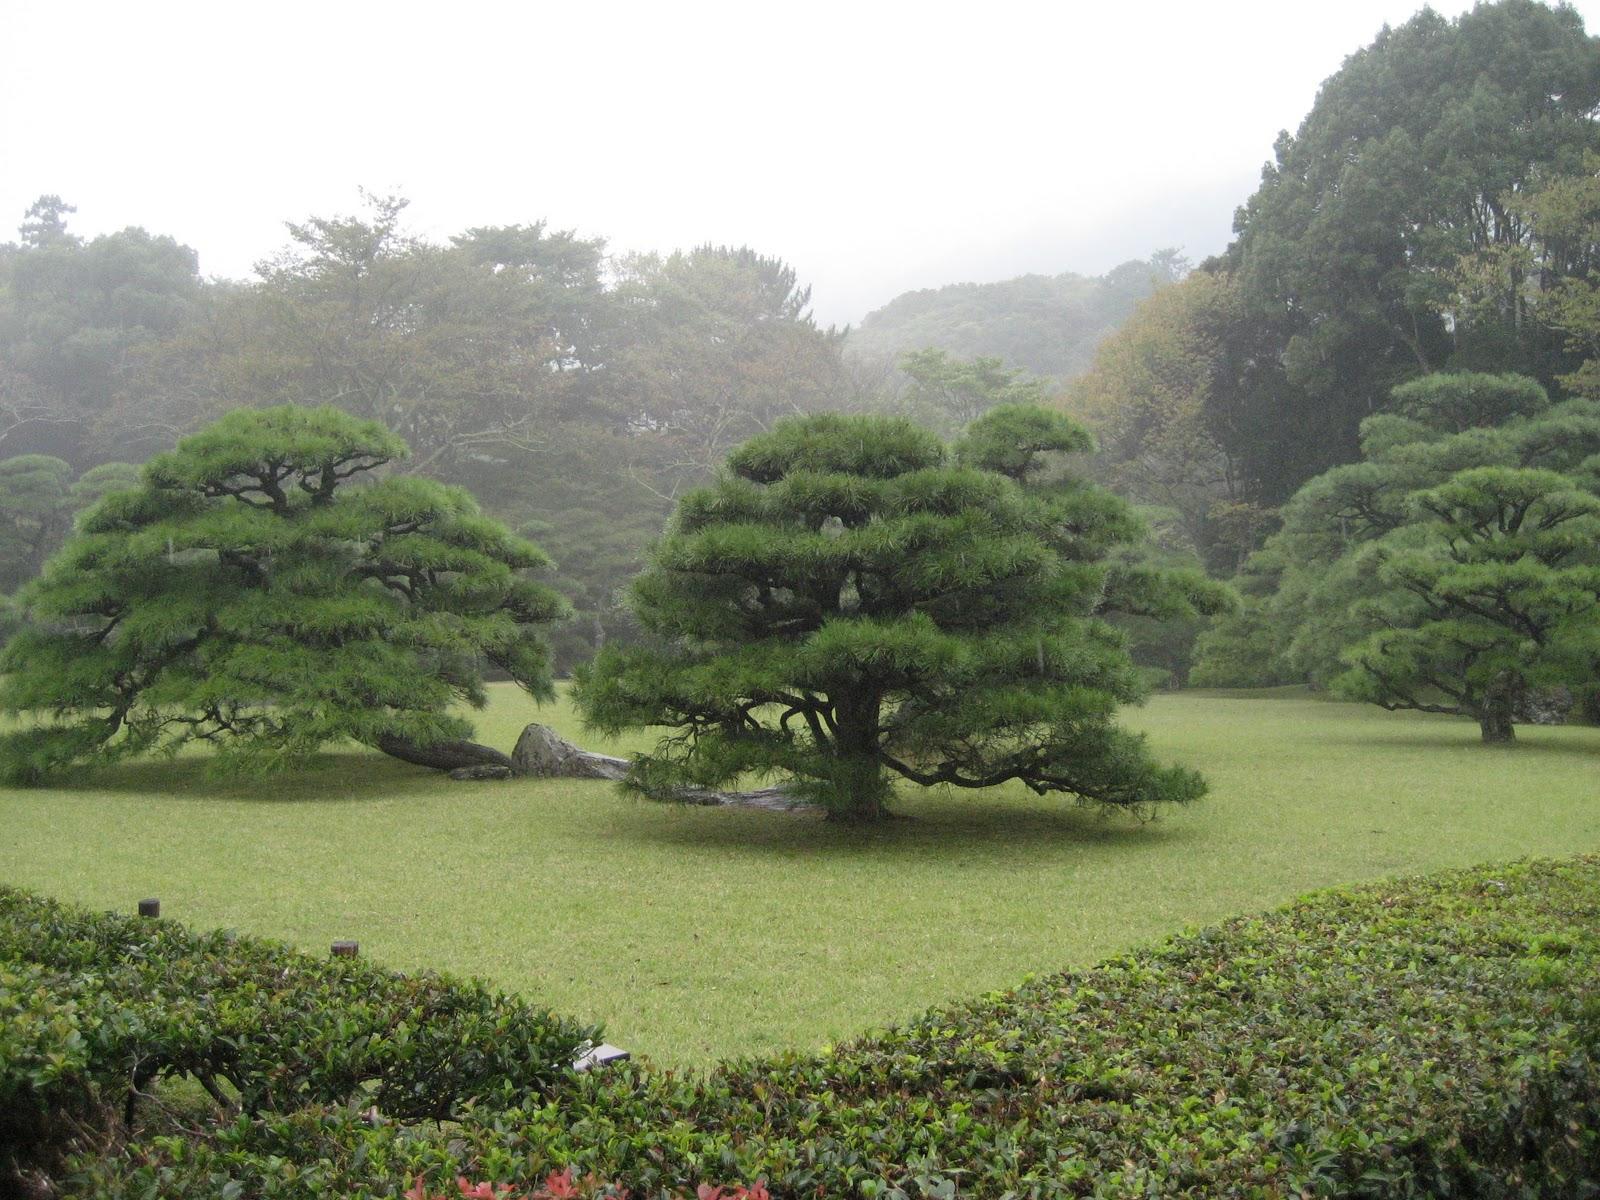 Mie Japan  City pictures : mochimochi sembei: Ise Jingu Mie Prefecture, Japan